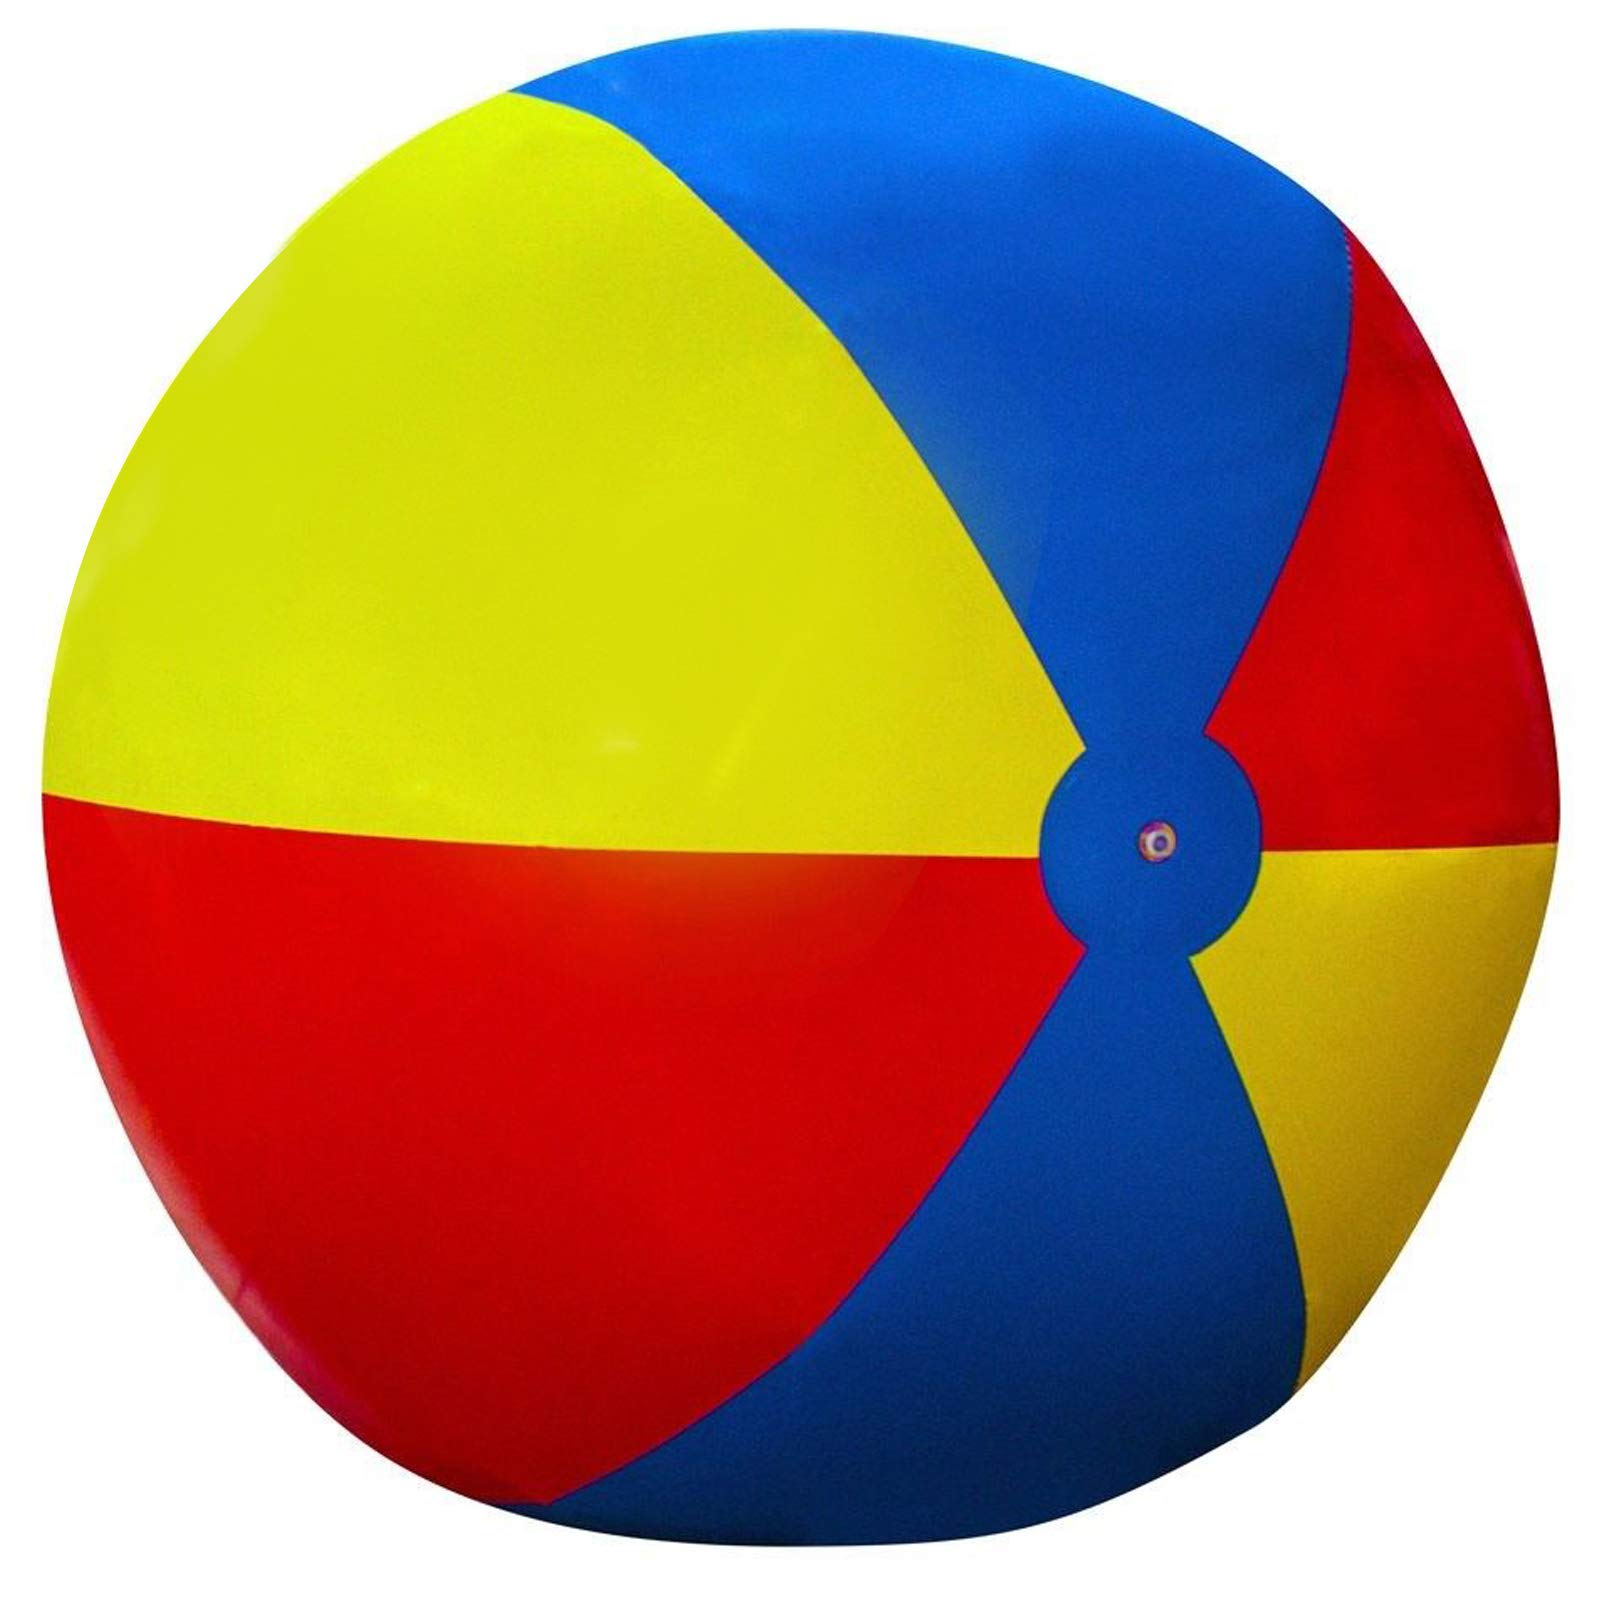 Happibuy Giant Beach Ball 6 ft / 8 ft Diameter Extra Large Inflatable Beach Ball Pool Toy Jumbo Beach Ball (8' Beach Ball) by Happibuy